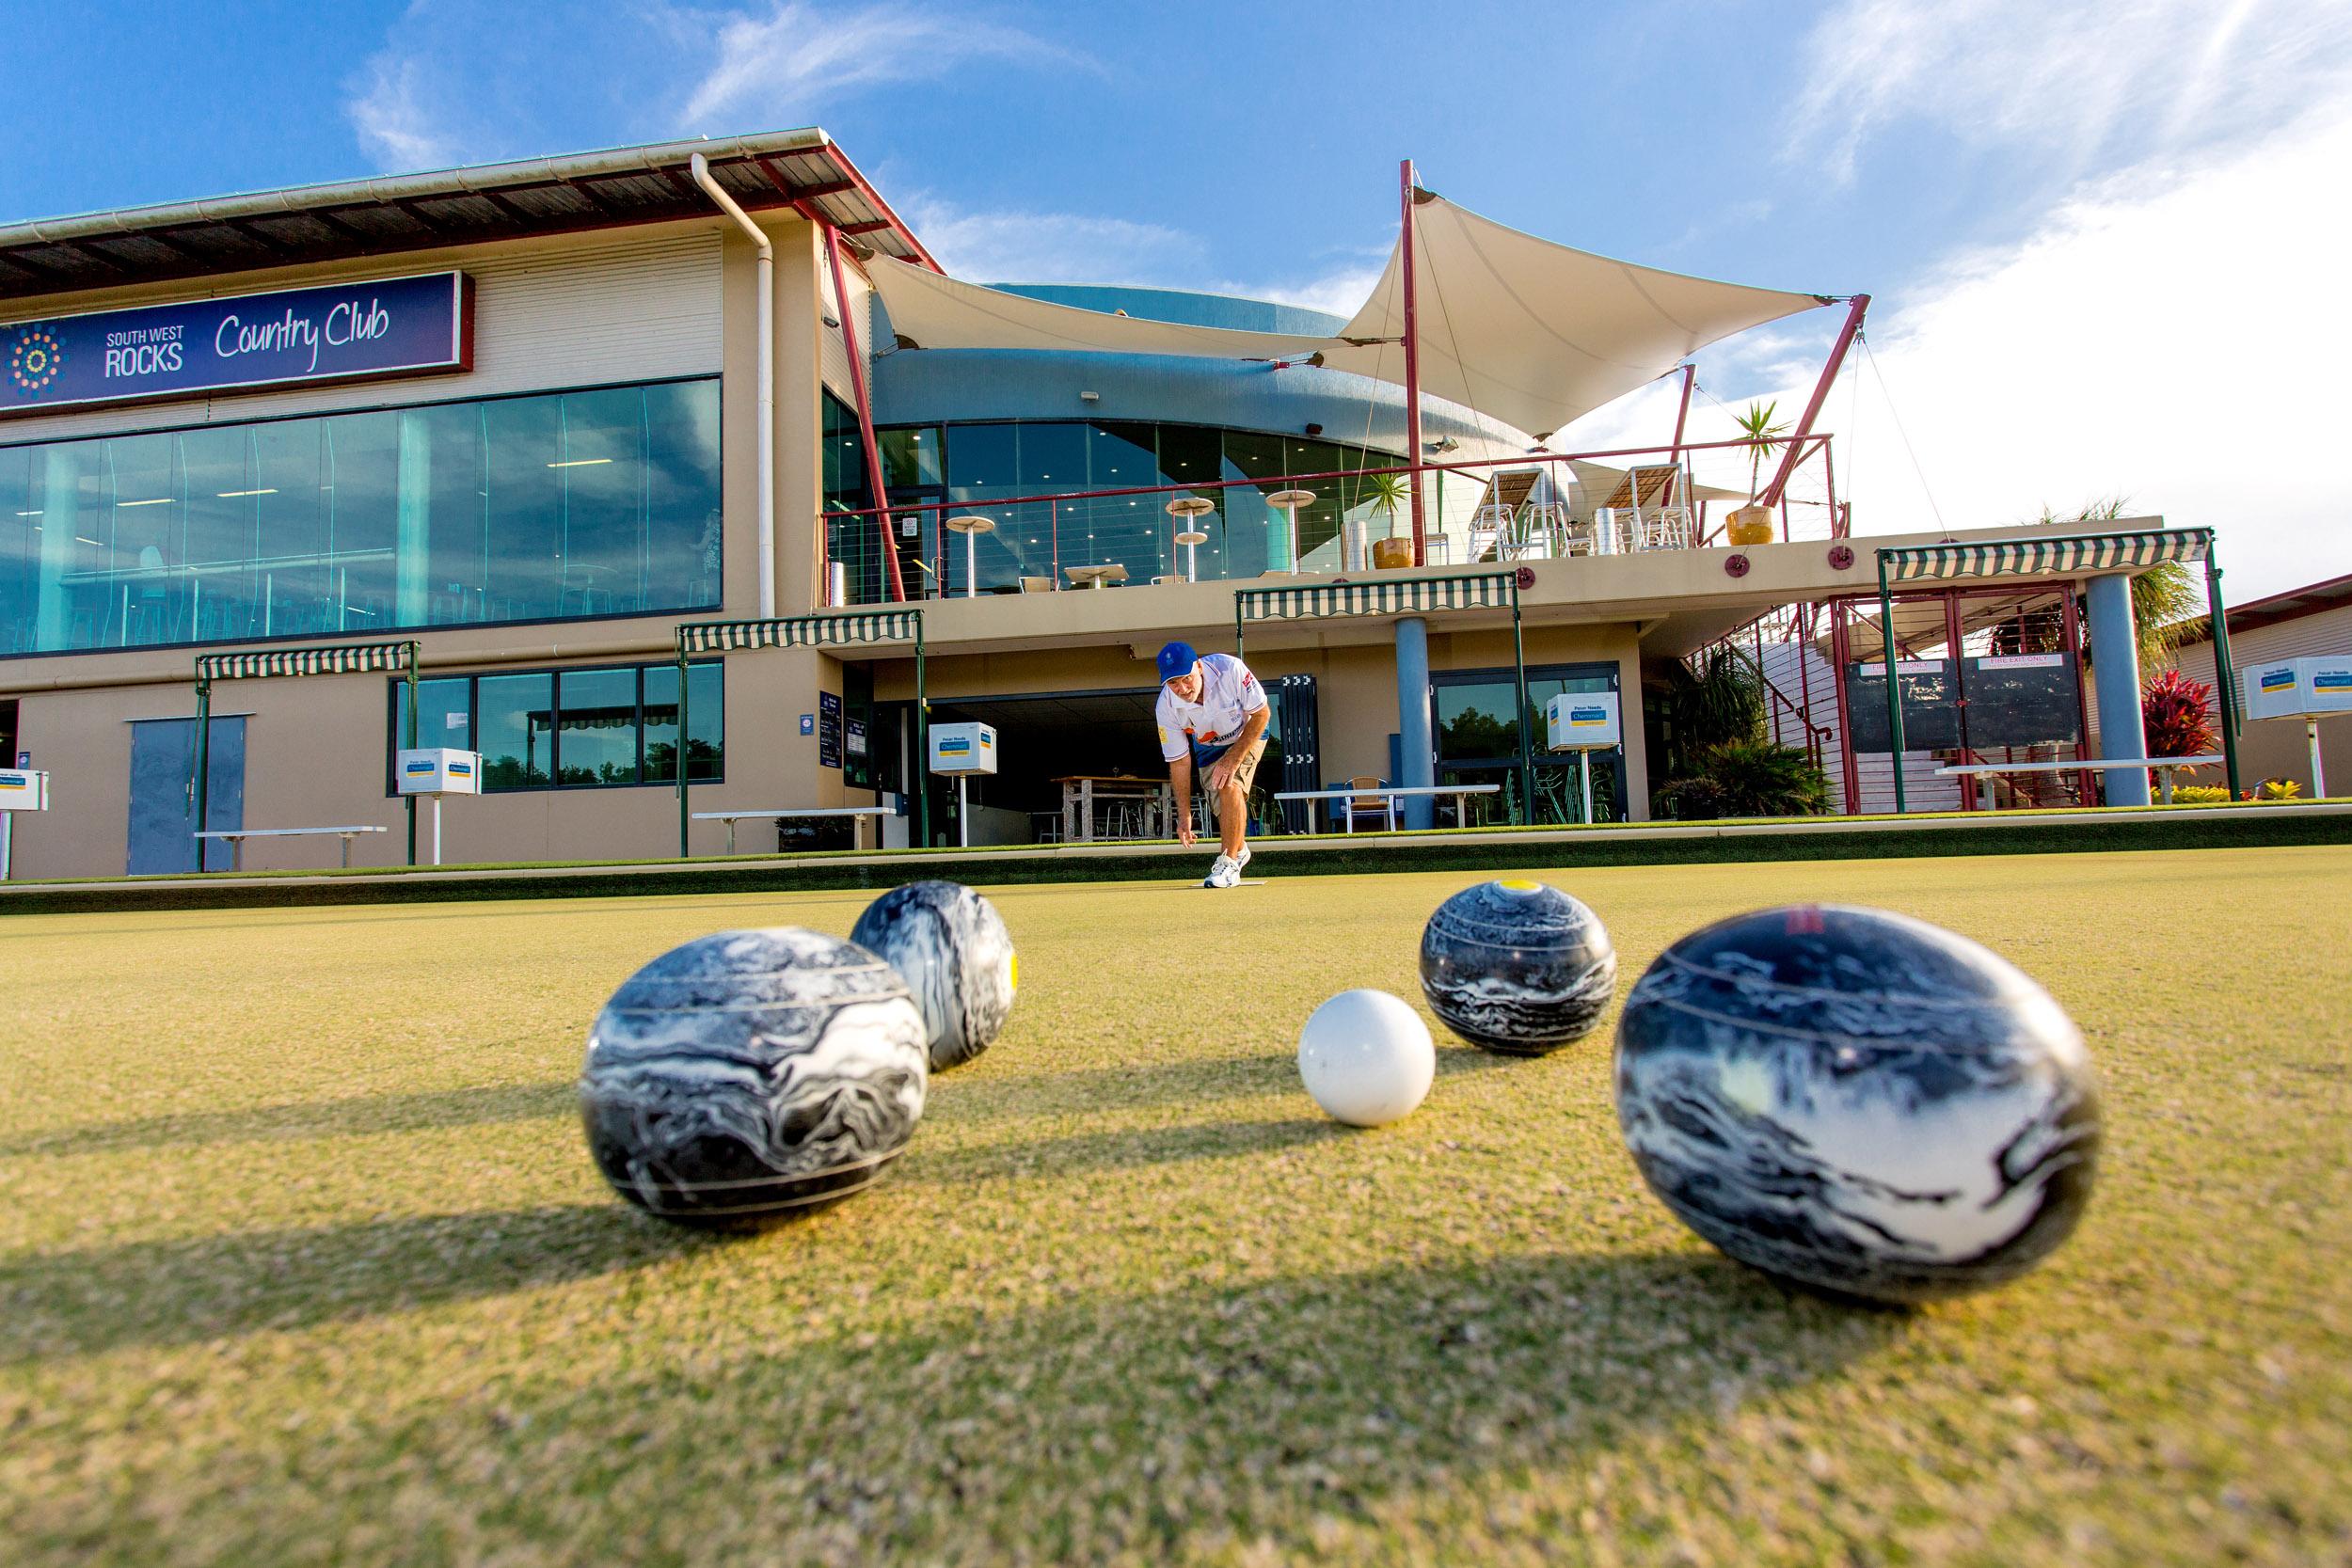 south-west-rocks-country-club-bowls.jpg